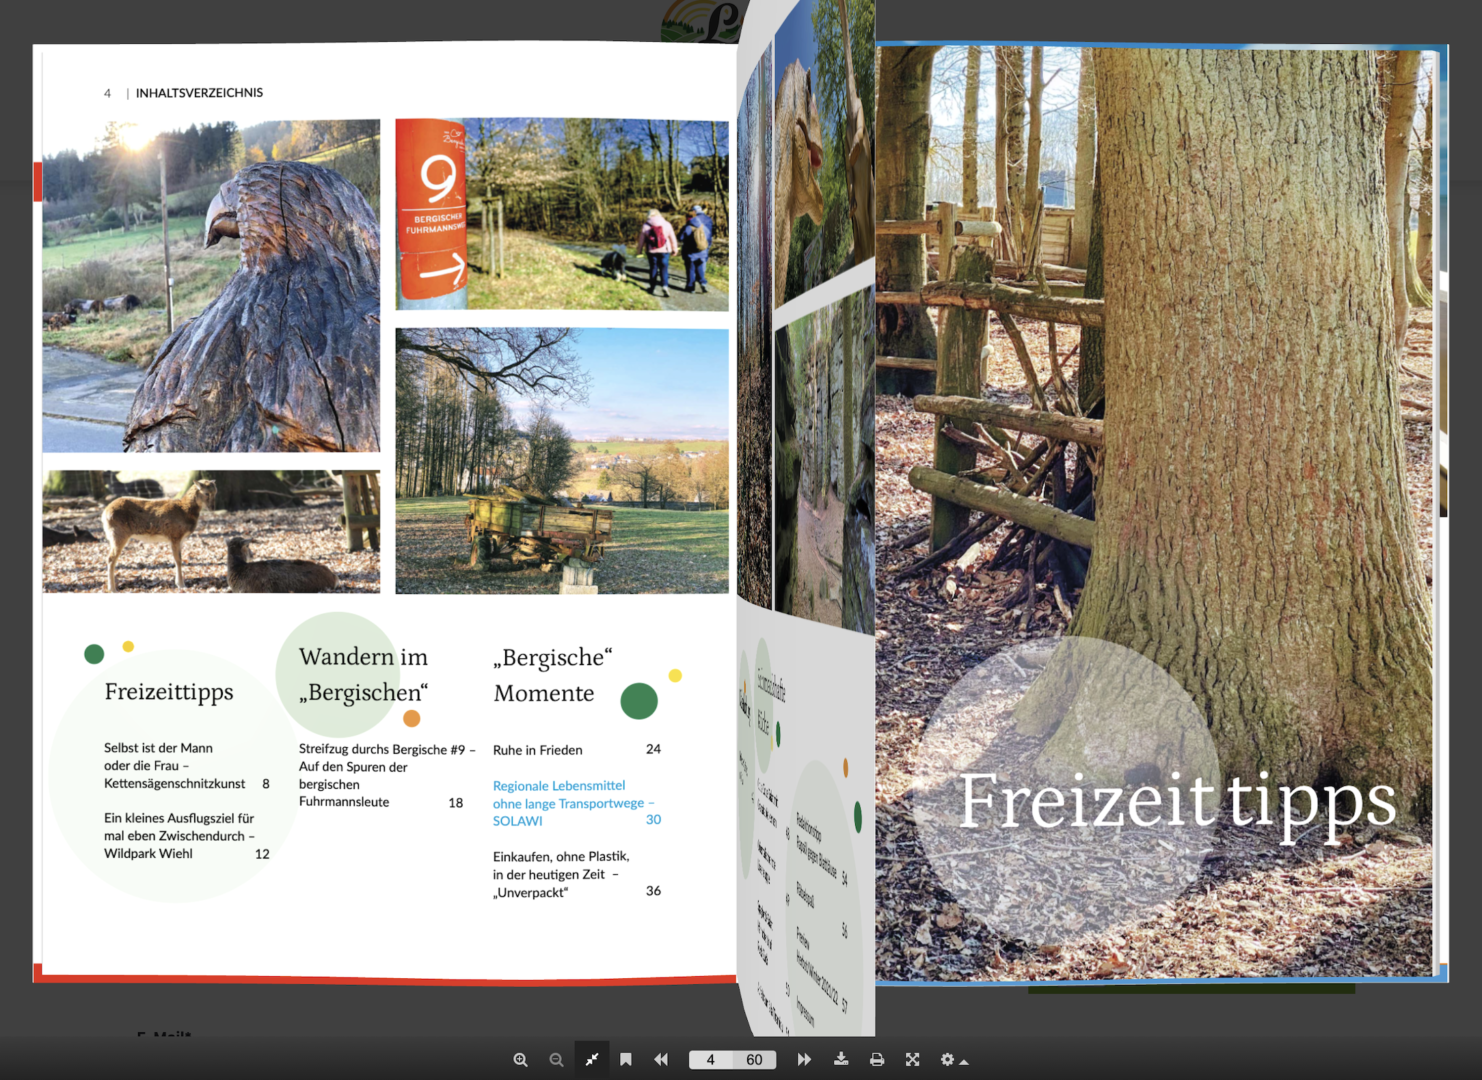 LandMomente ePaper - Flipbook